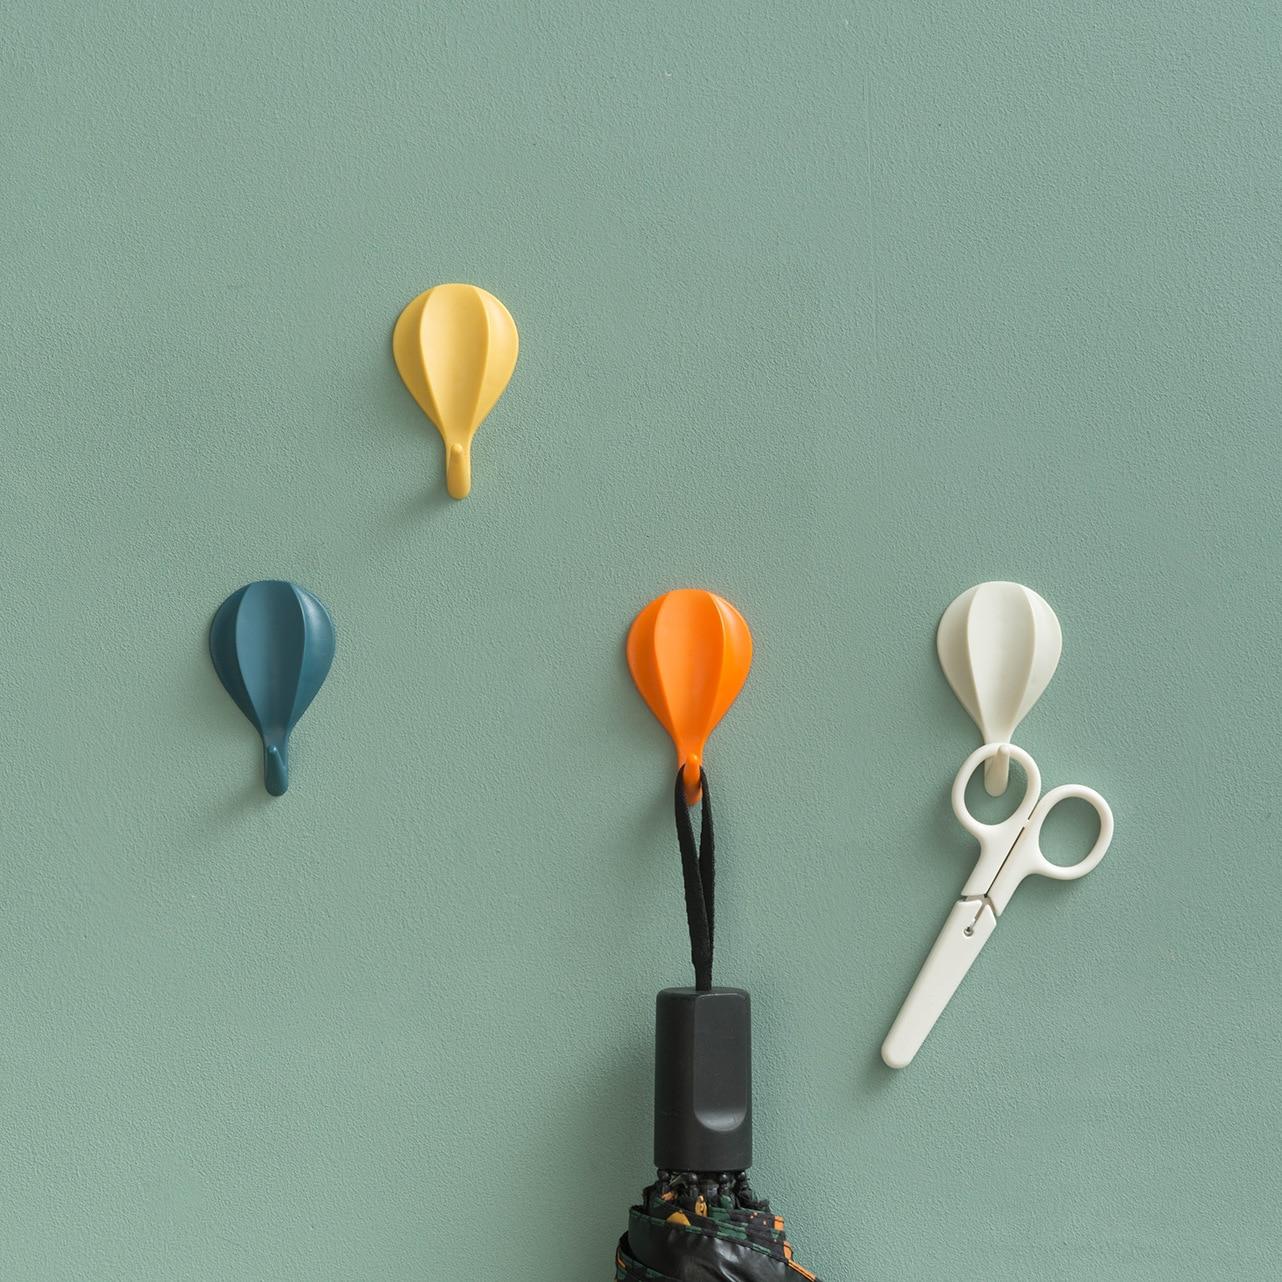 New Plastic Hot Air Balloon Wall Hanging Kitchen Hook Seamless Door Solid Hook Rack Key Holder Wall Hooks Decorative Hanger